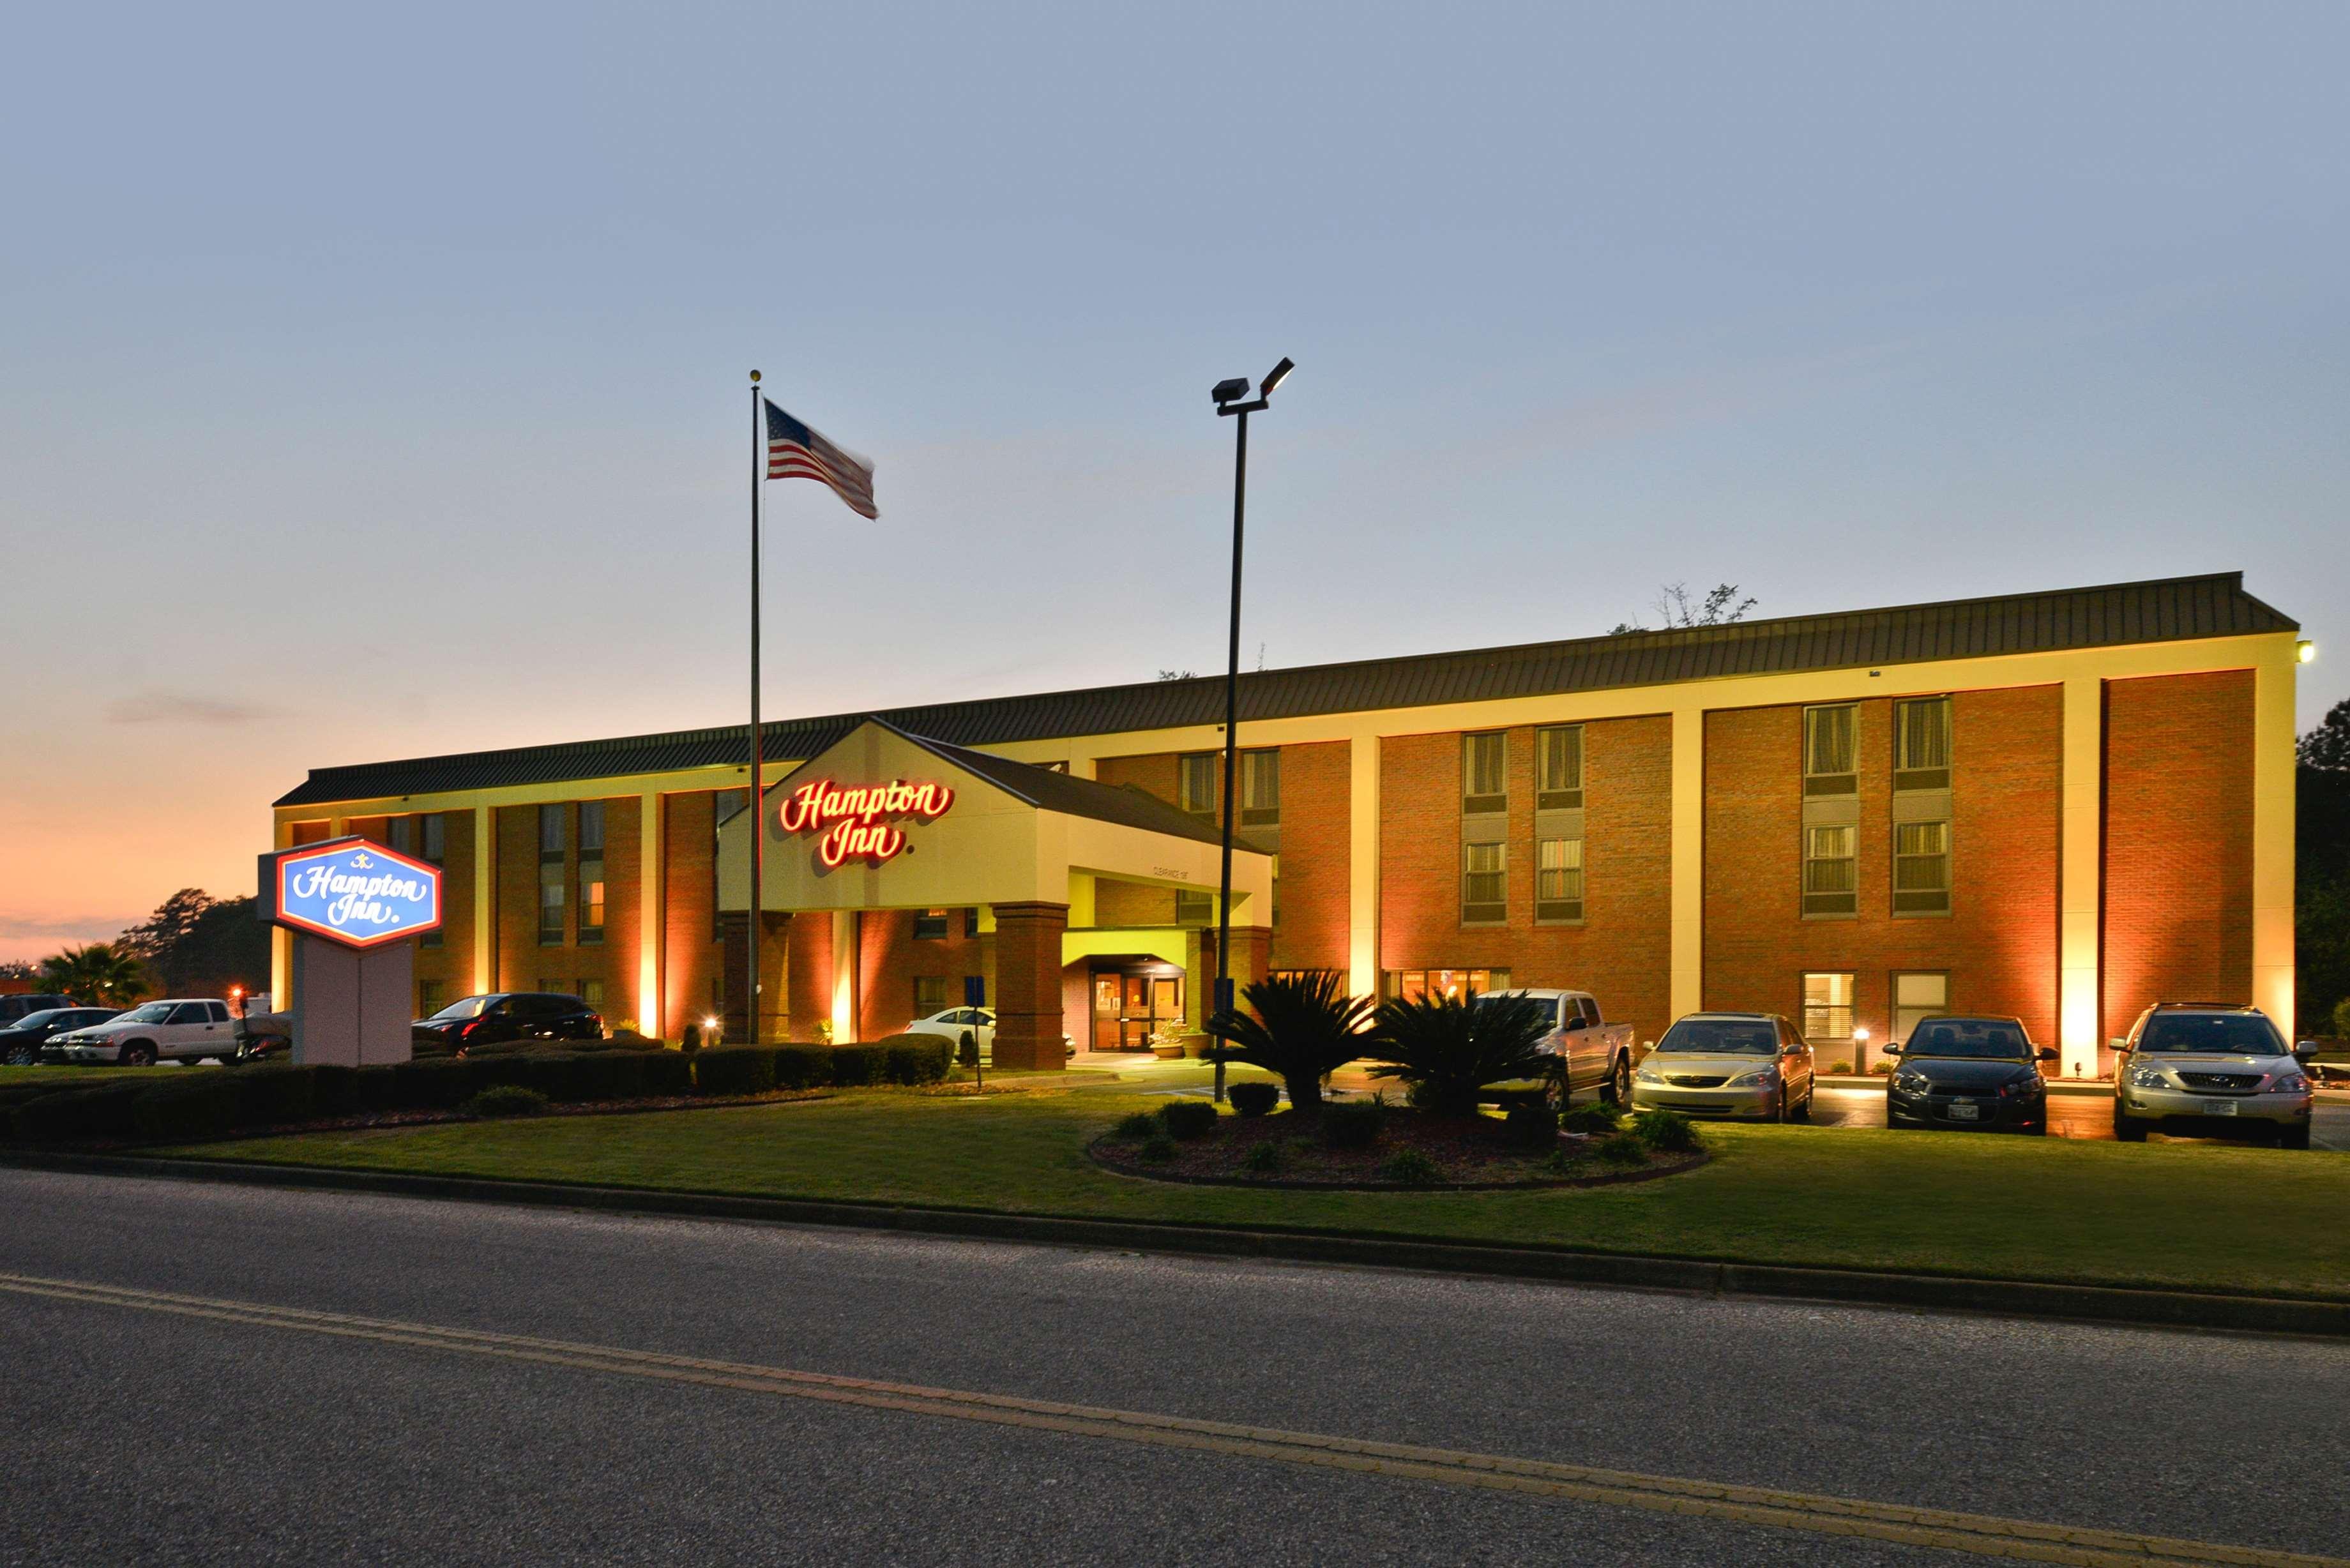 Hampton Inn Greenville image 1